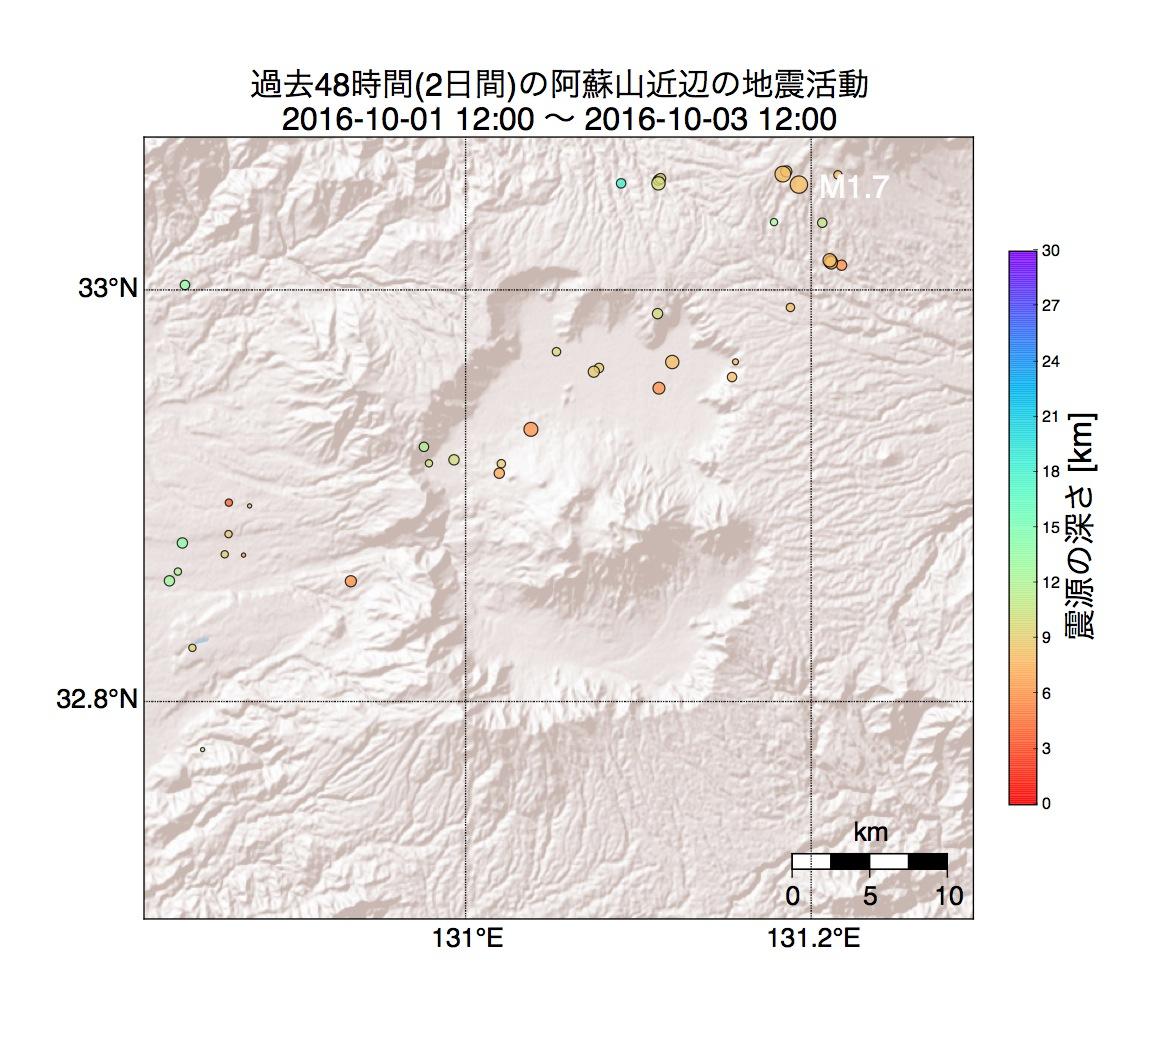 http://jishin.chamu.org/aso/20161003_1.jpg